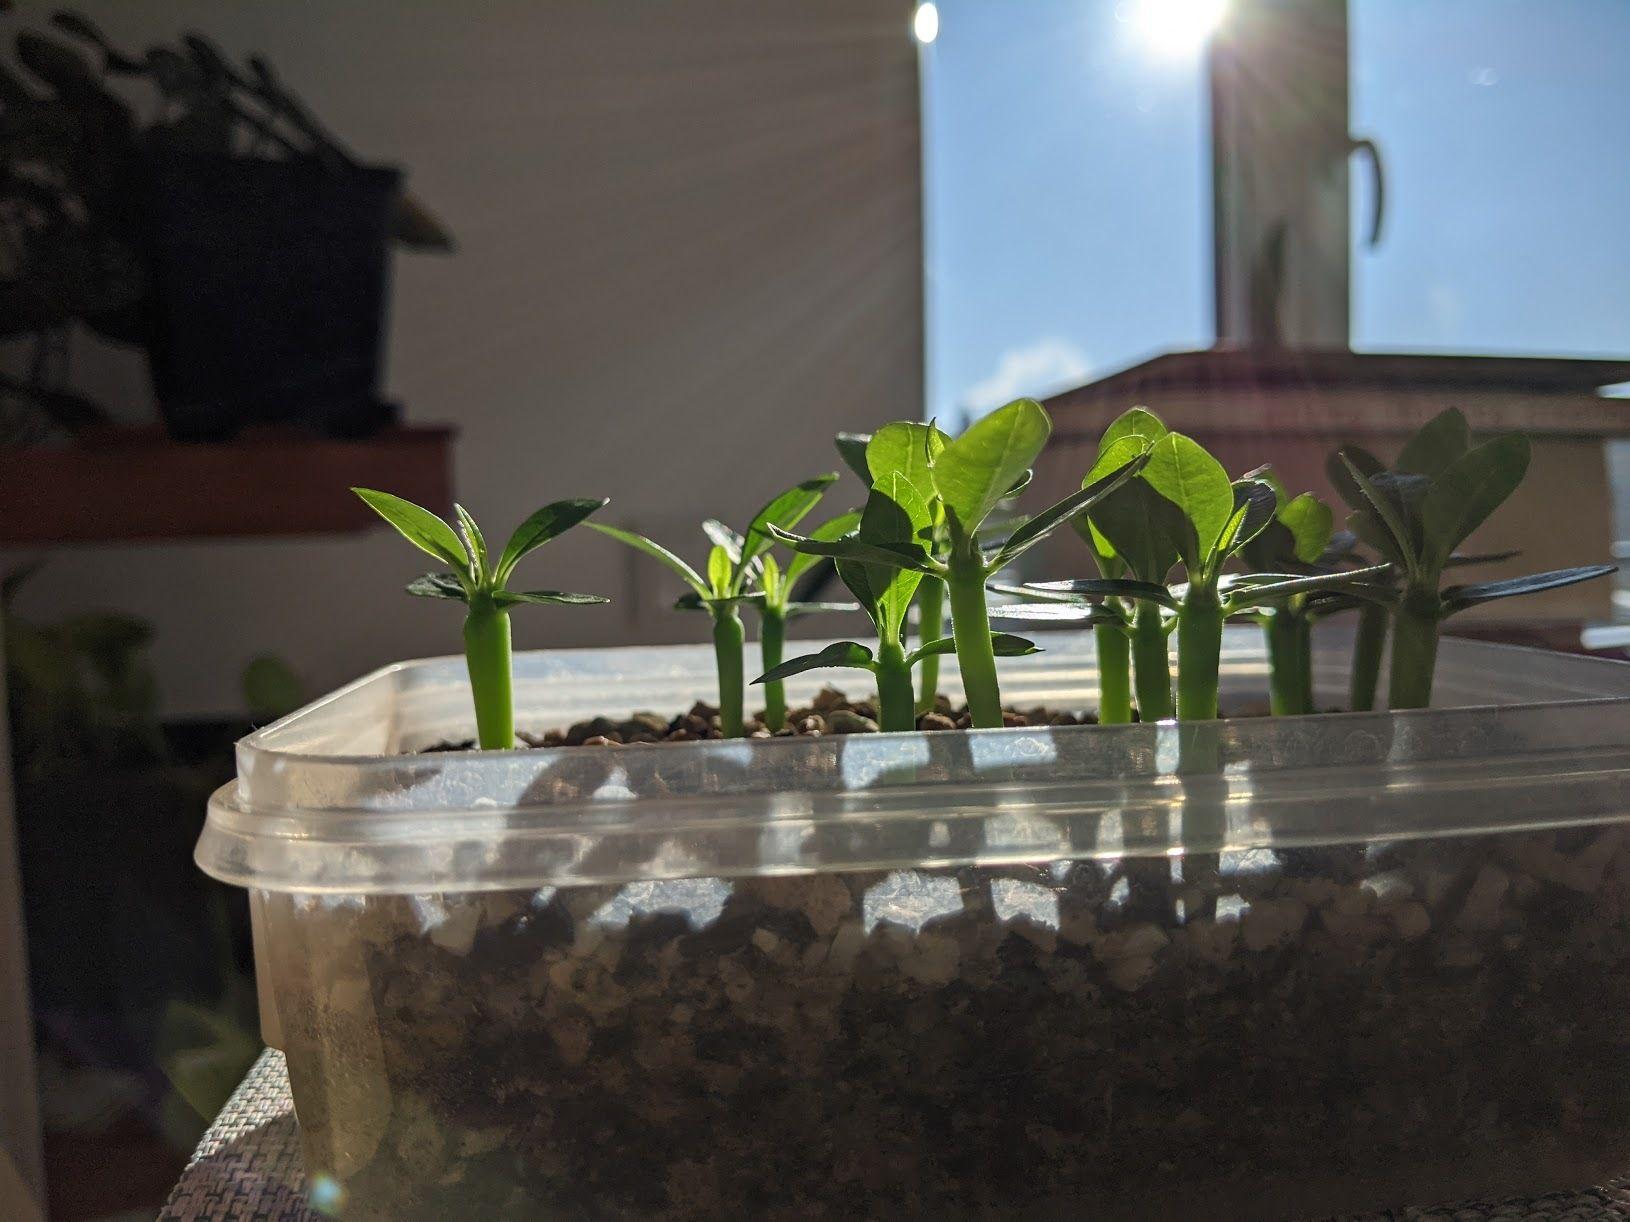 Pachypodium ambongense seedlings